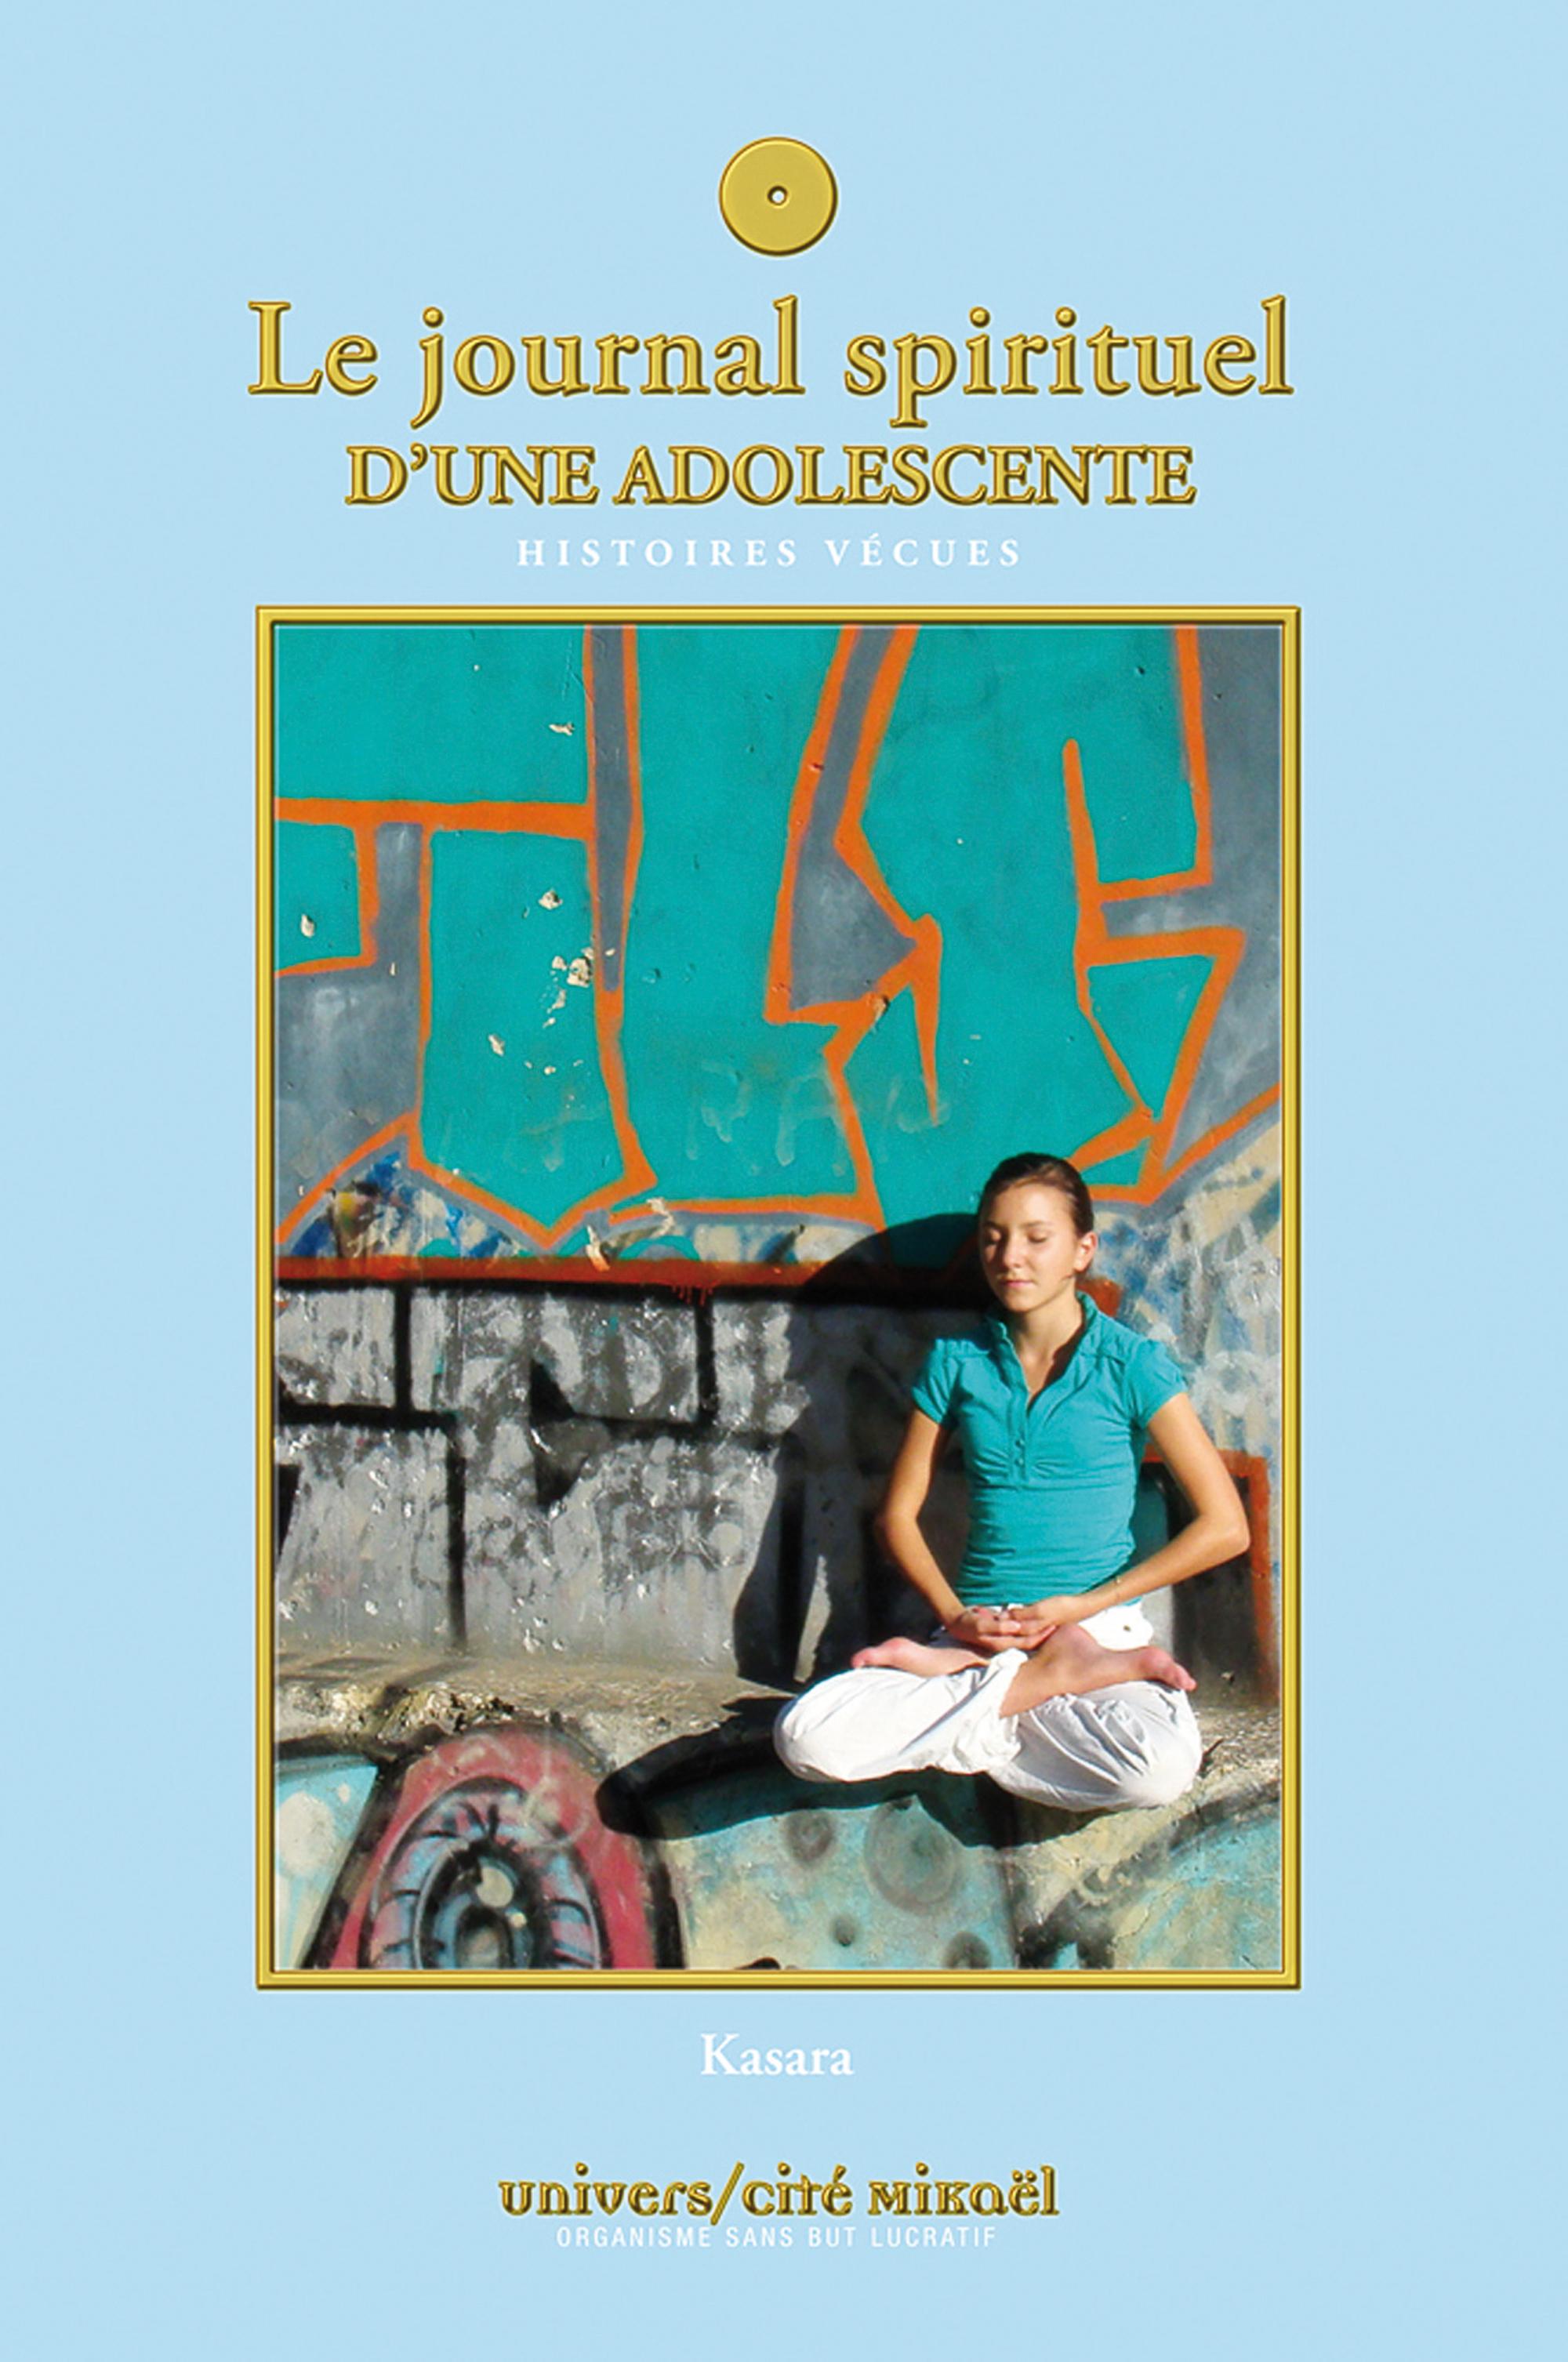 JOURNAL SPIRITUEL D'UNE ADOLESCENTE